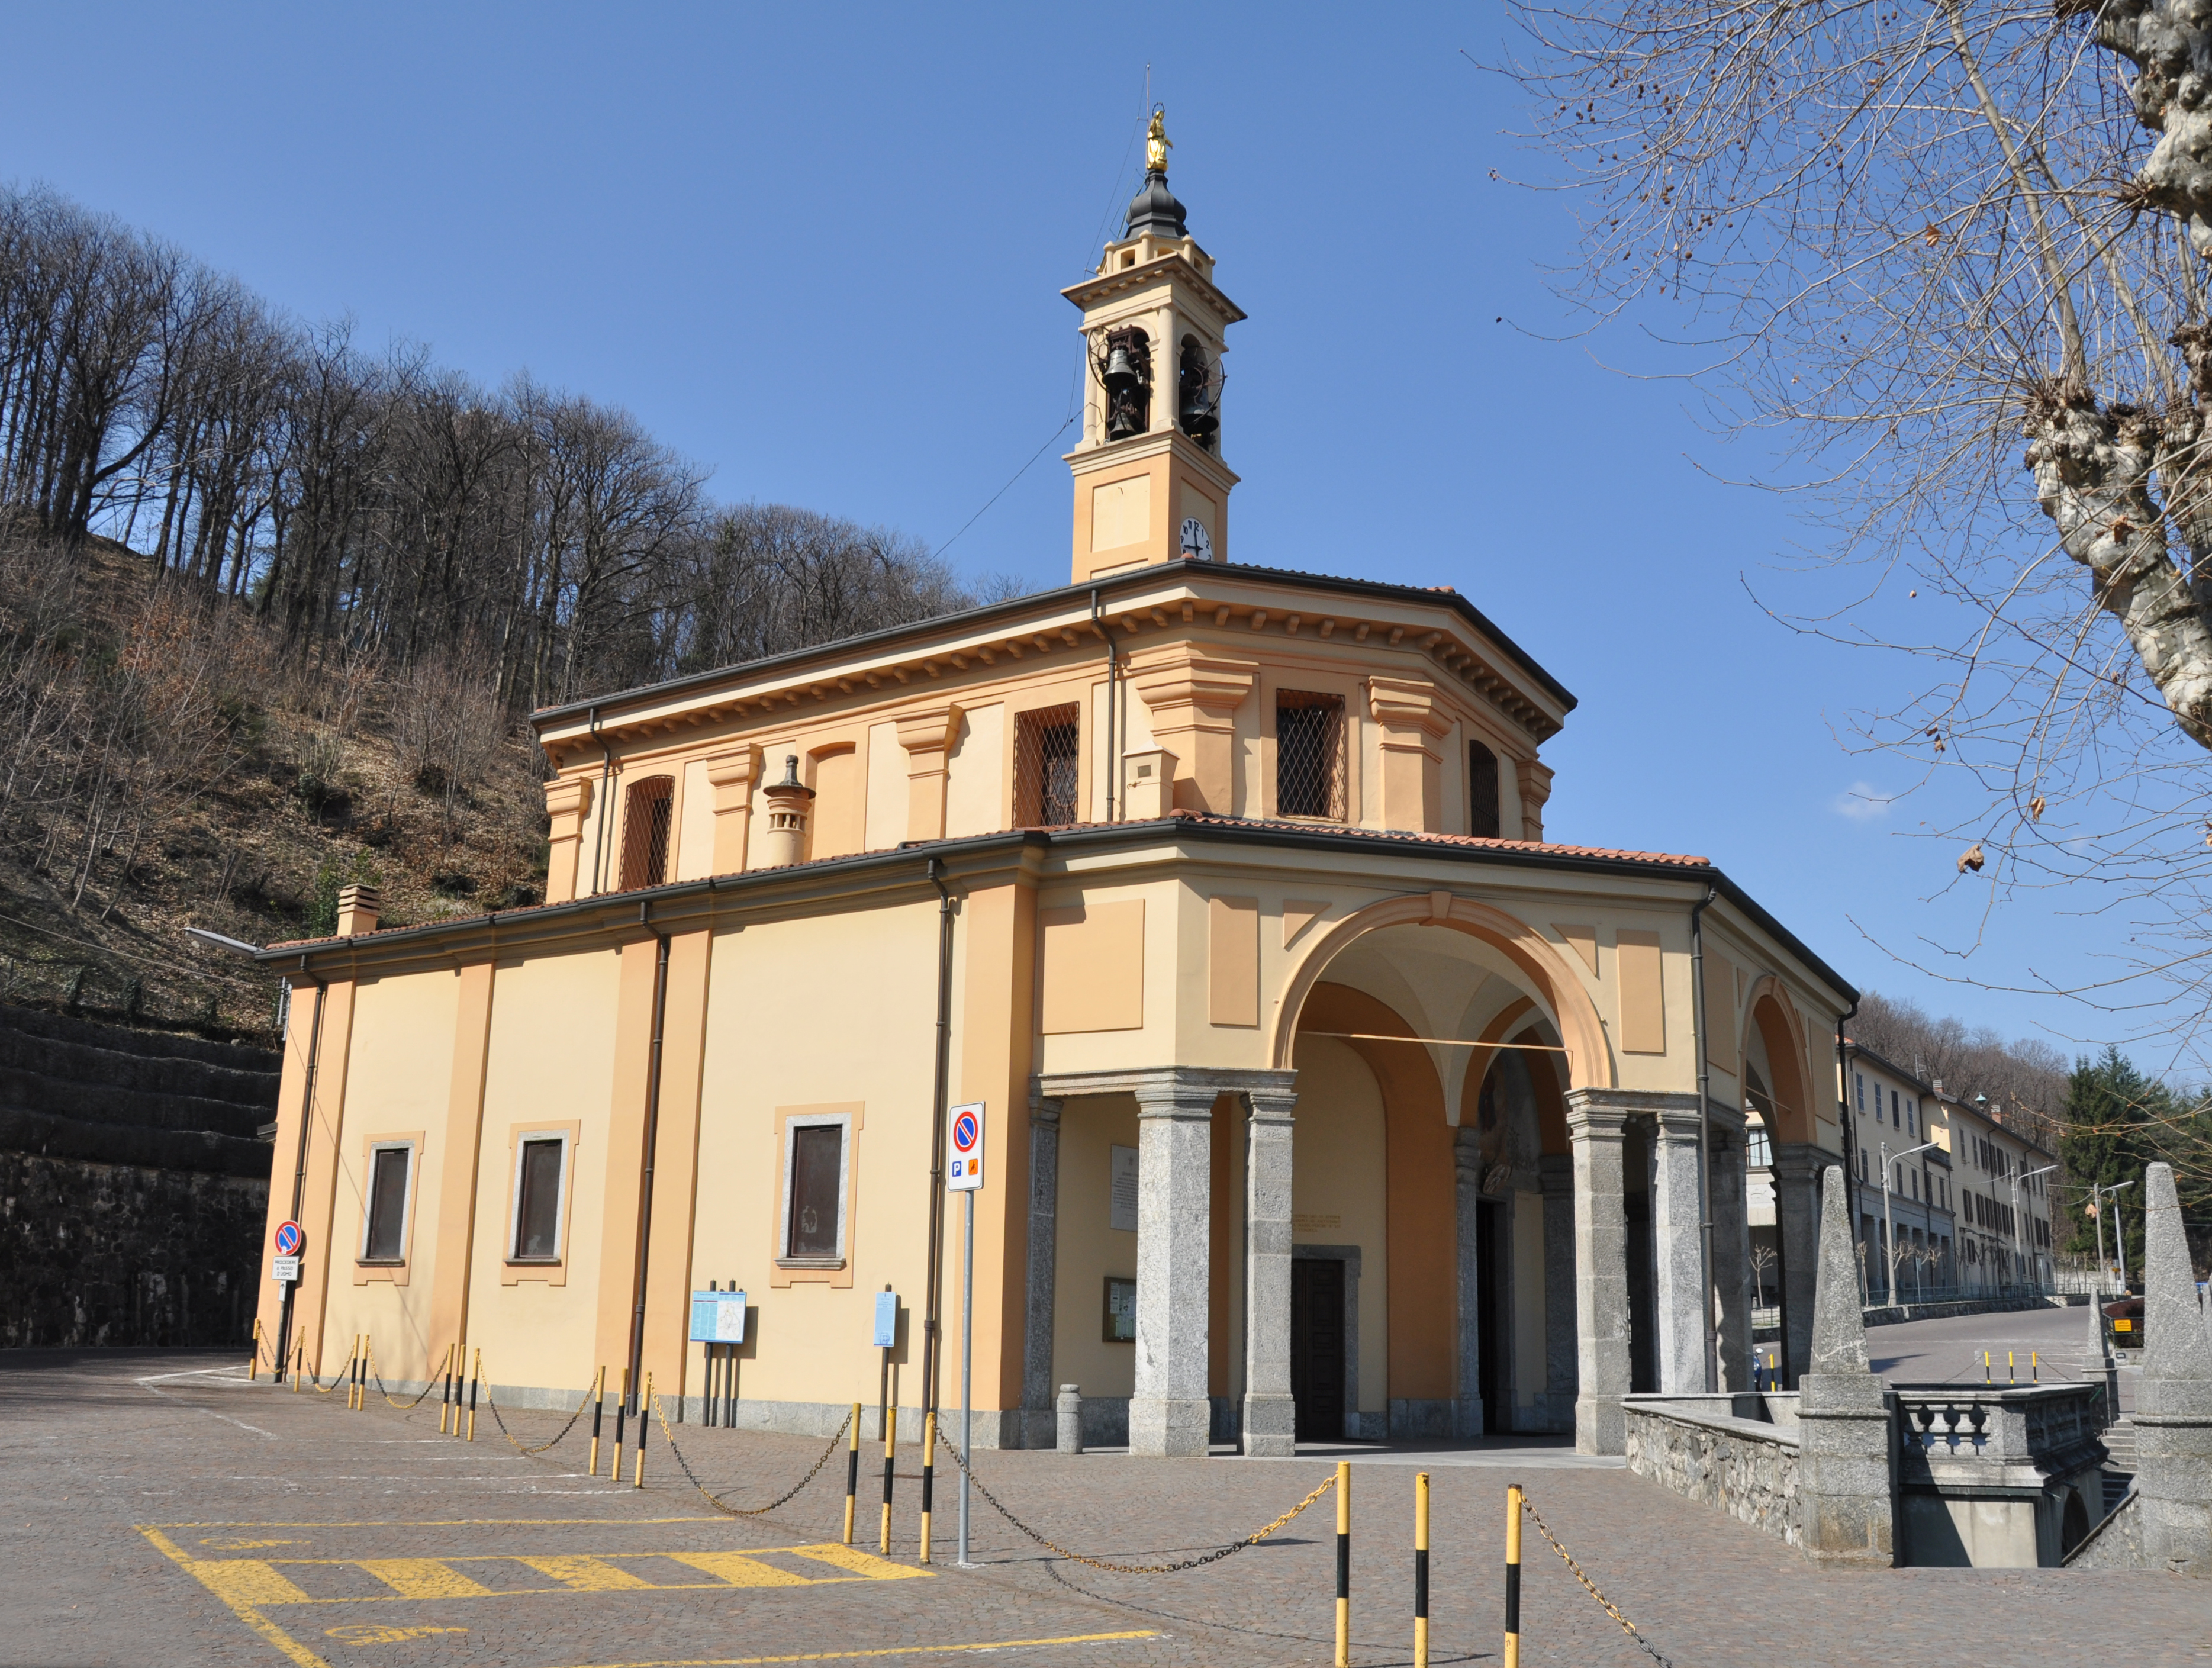 Pellegrinaggio Al Santuario Della Madonna Del Bosco